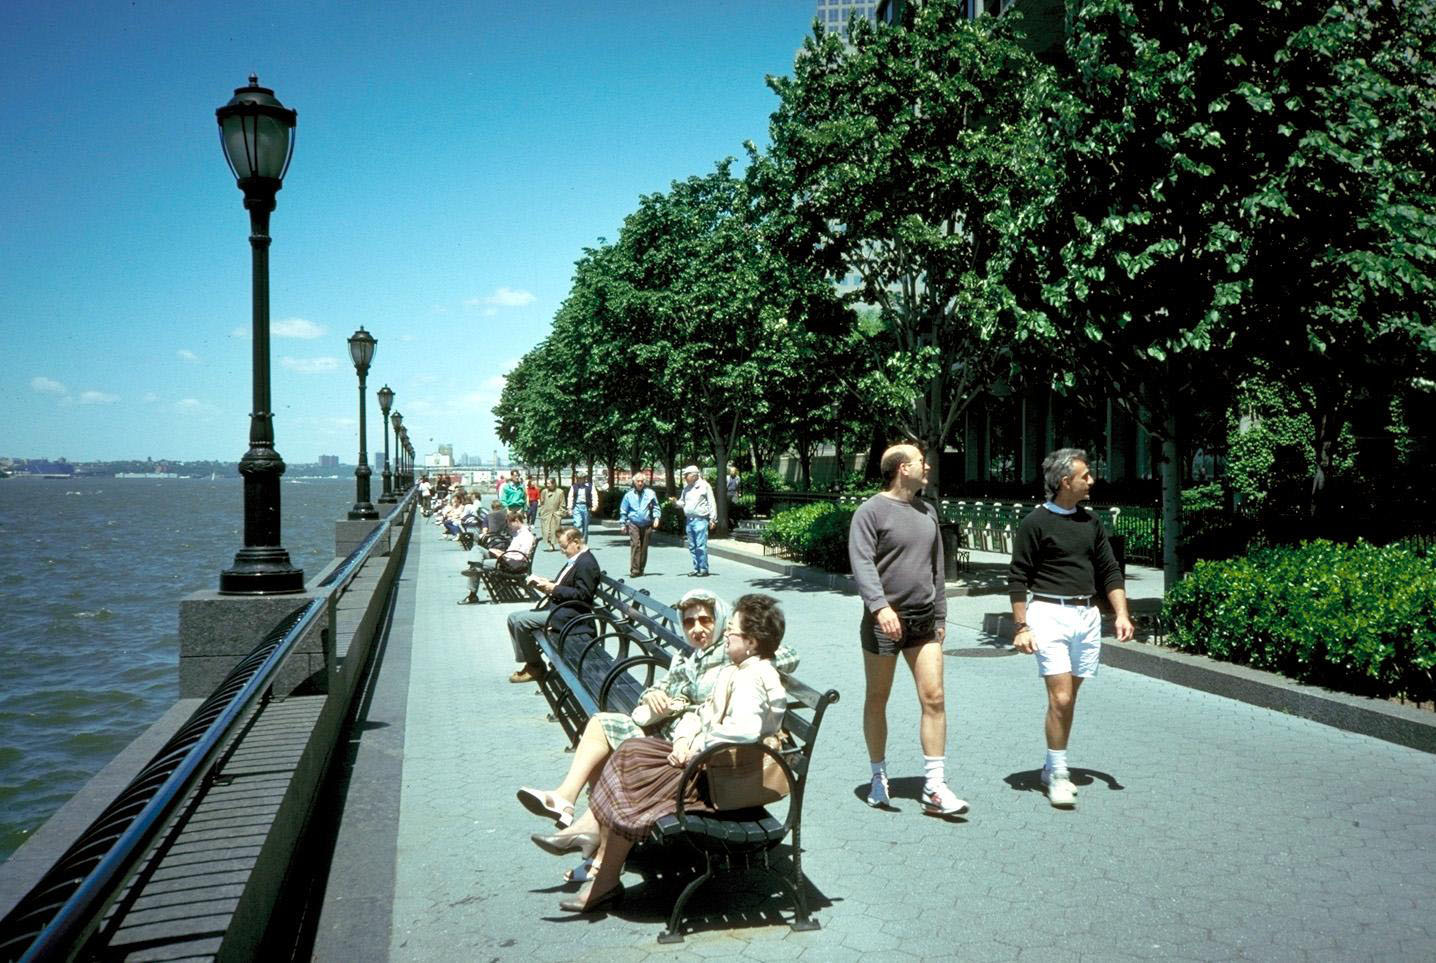 Battery Park City Parks